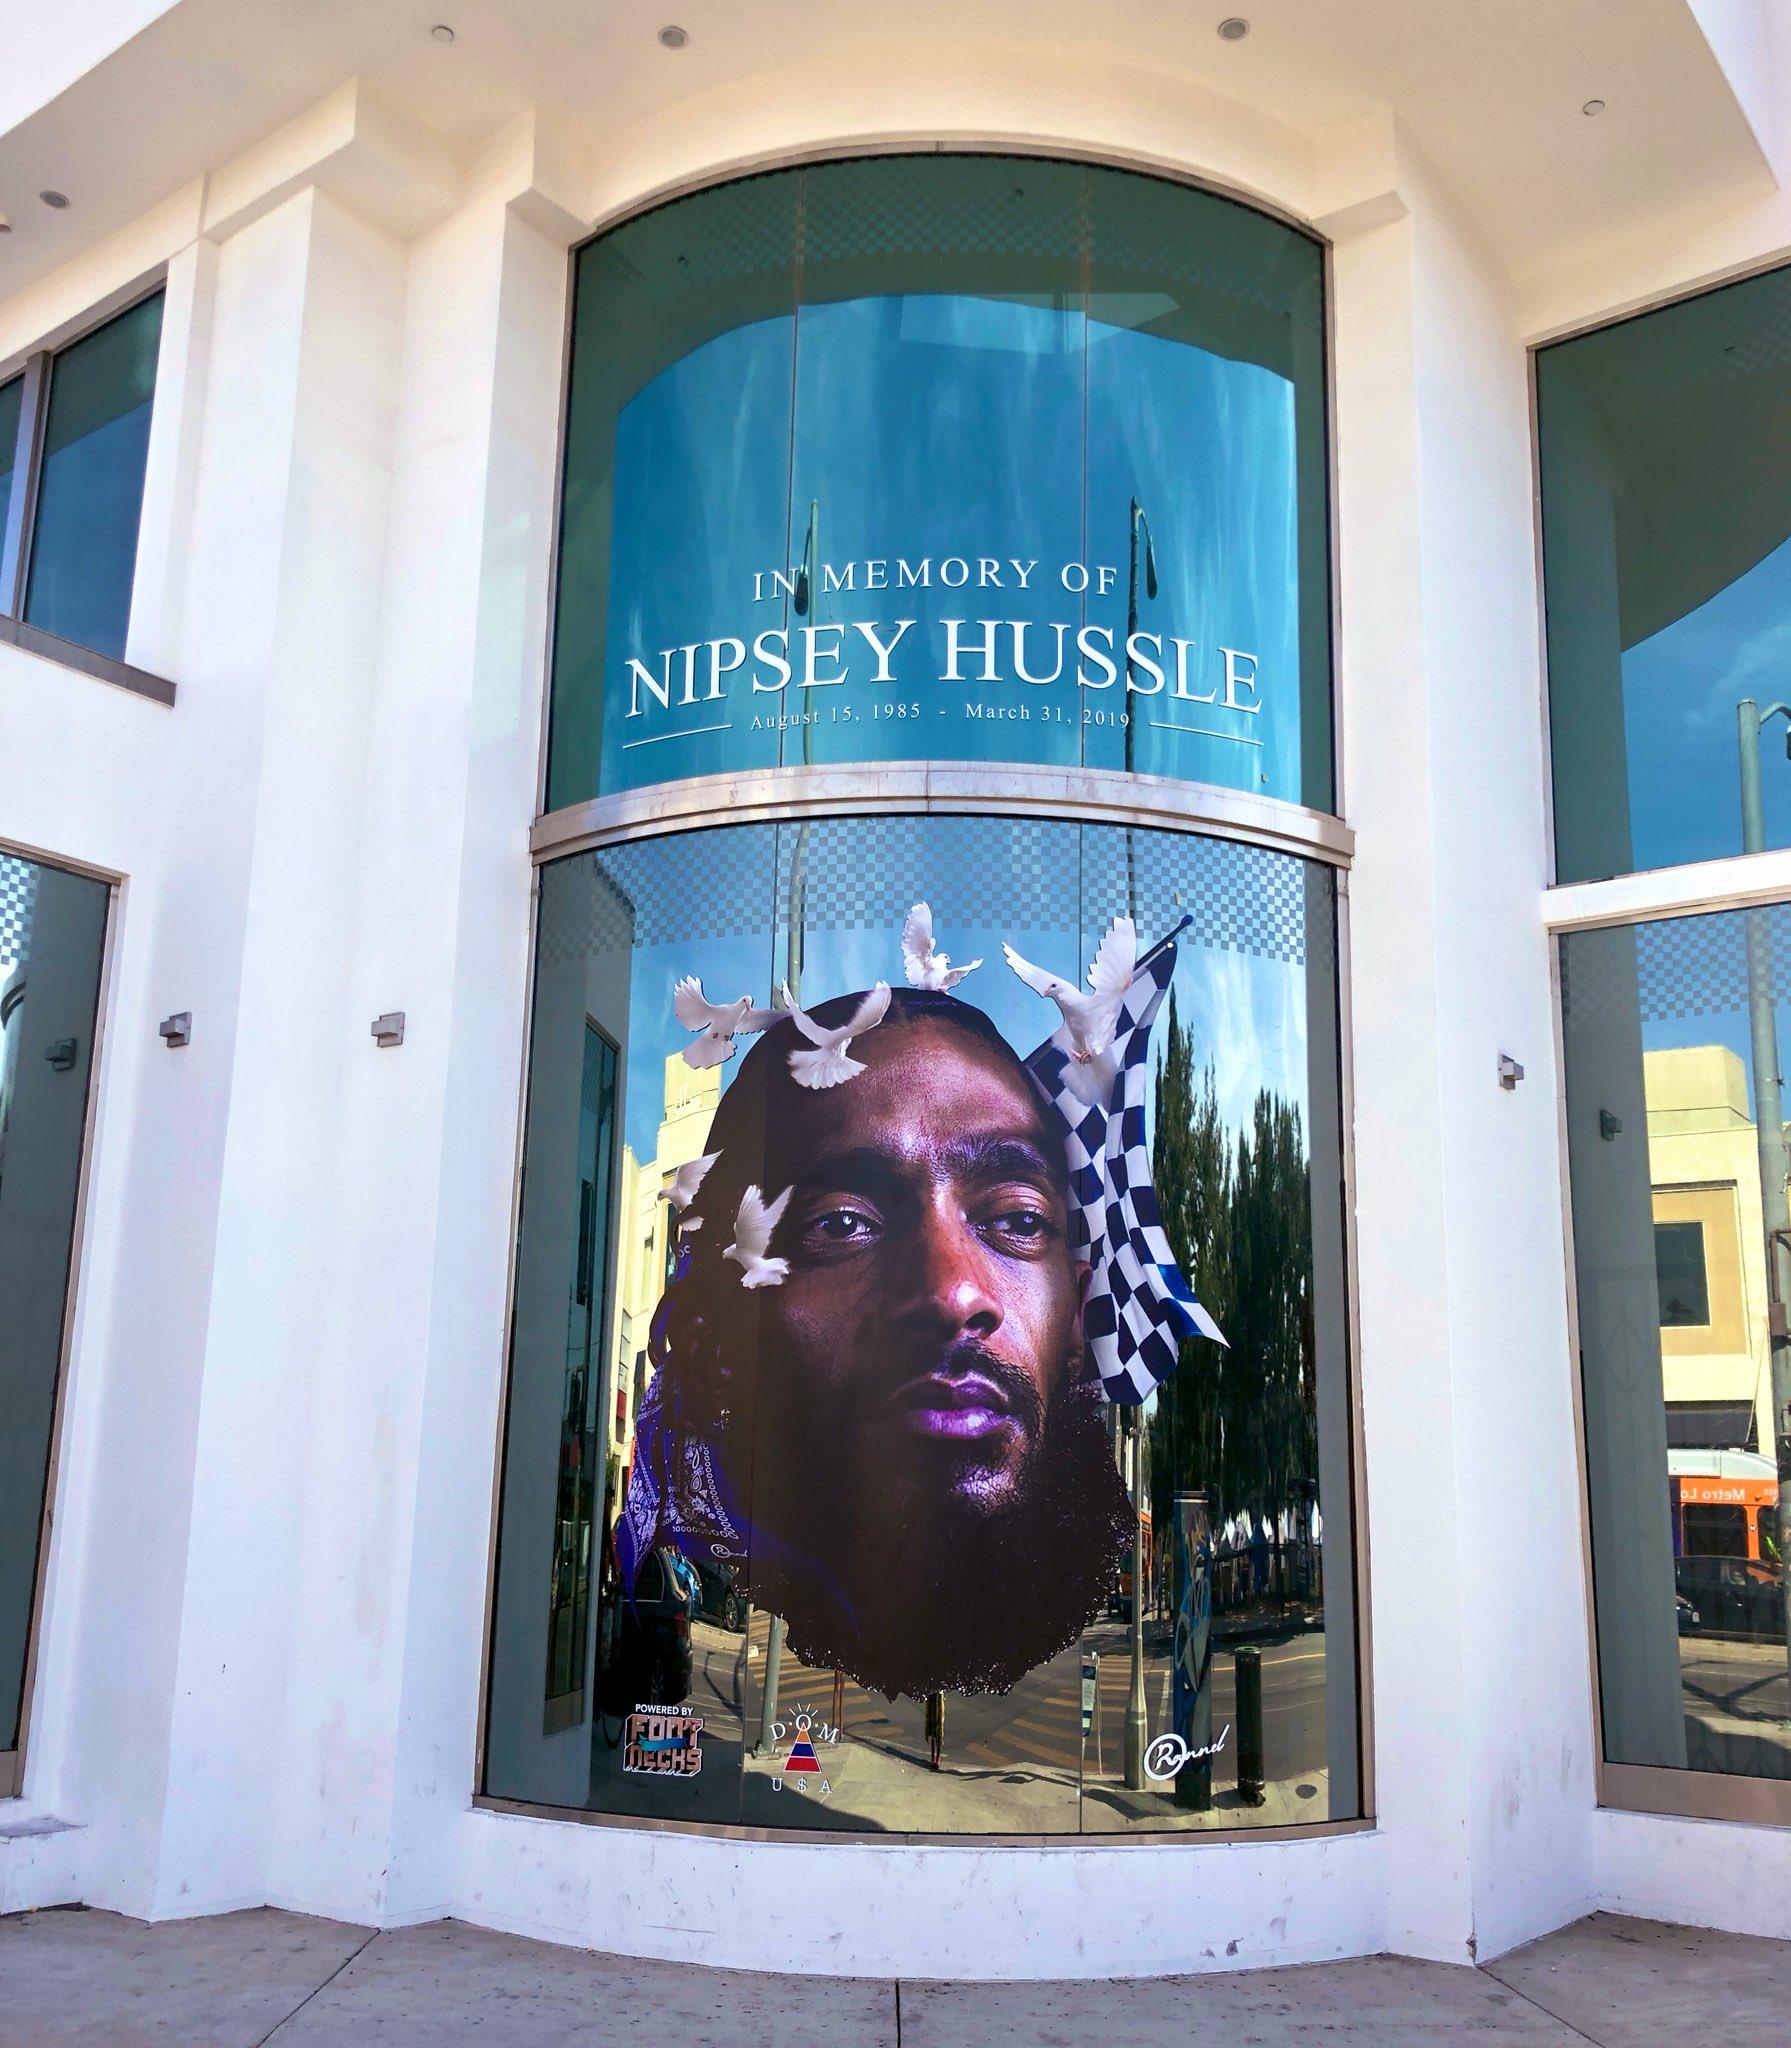 FairFax x Melrose Nipsey Hussle Tribute Live ���� https://t.co/OqXnamKUCk